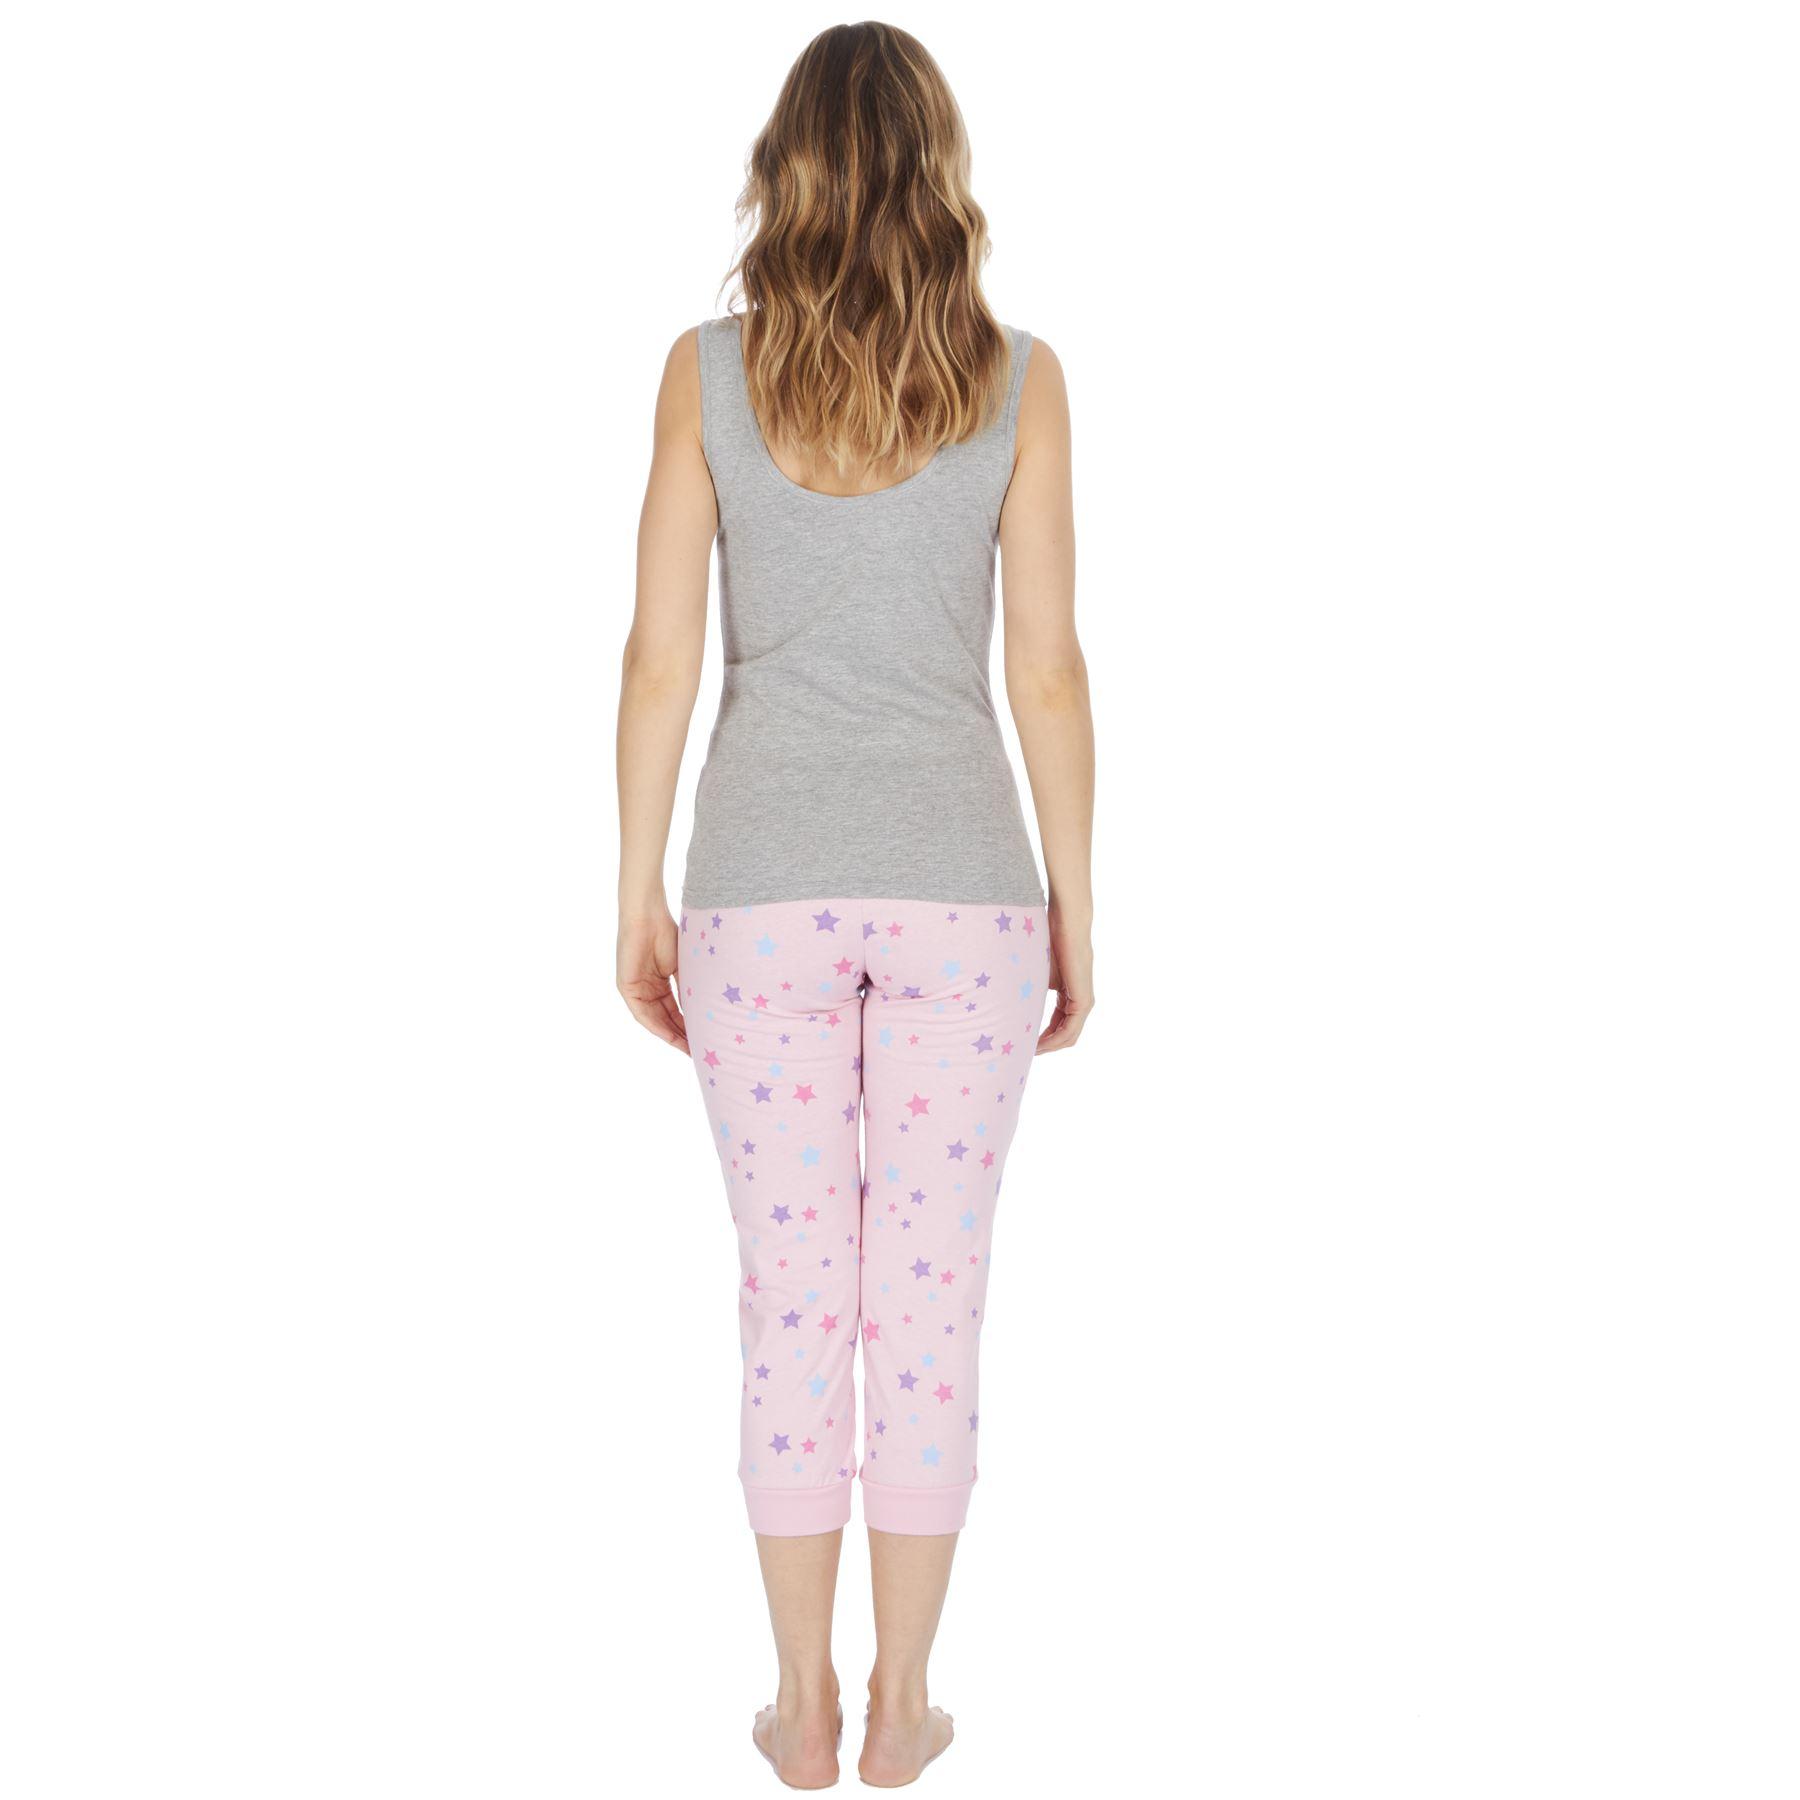 Womens-Ladies-Cotton-Pyjamas-Pyjama-PJs-Summer-Nightwear-Set-Size-8-18-NEW thumbnail 14